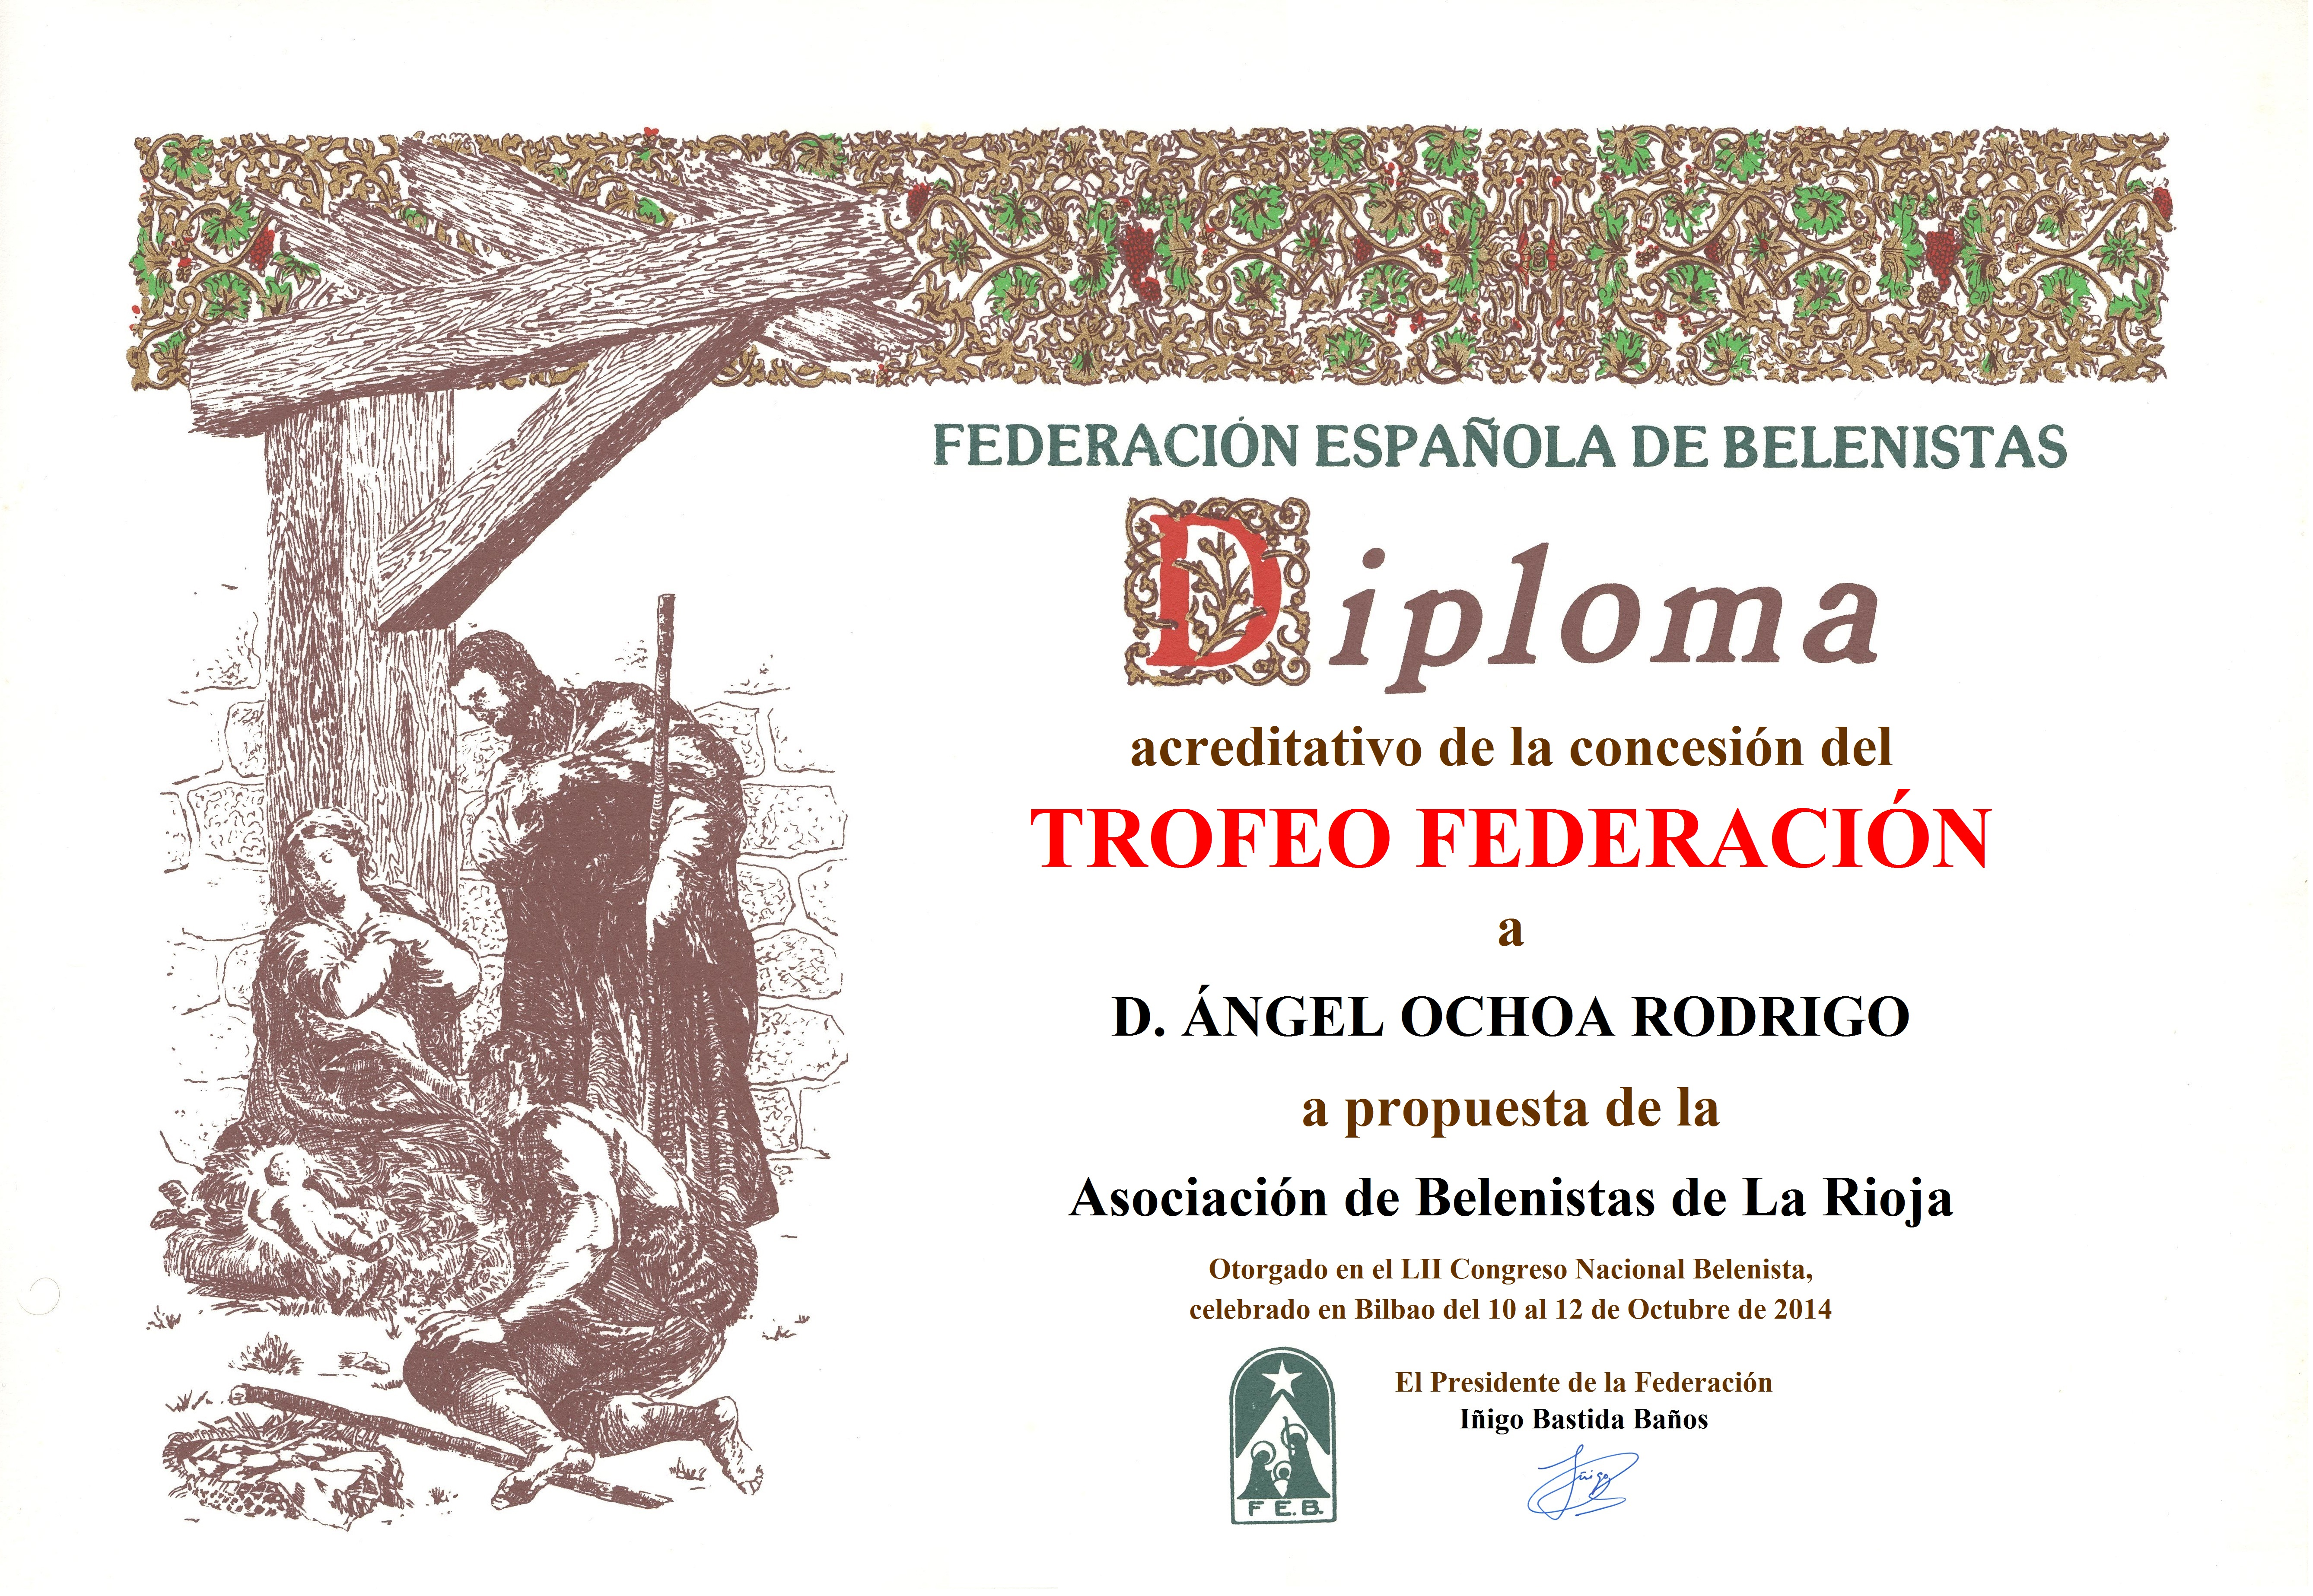 Diploma Trofeo FEB 2014 Ángel Ochoa Rodrigo